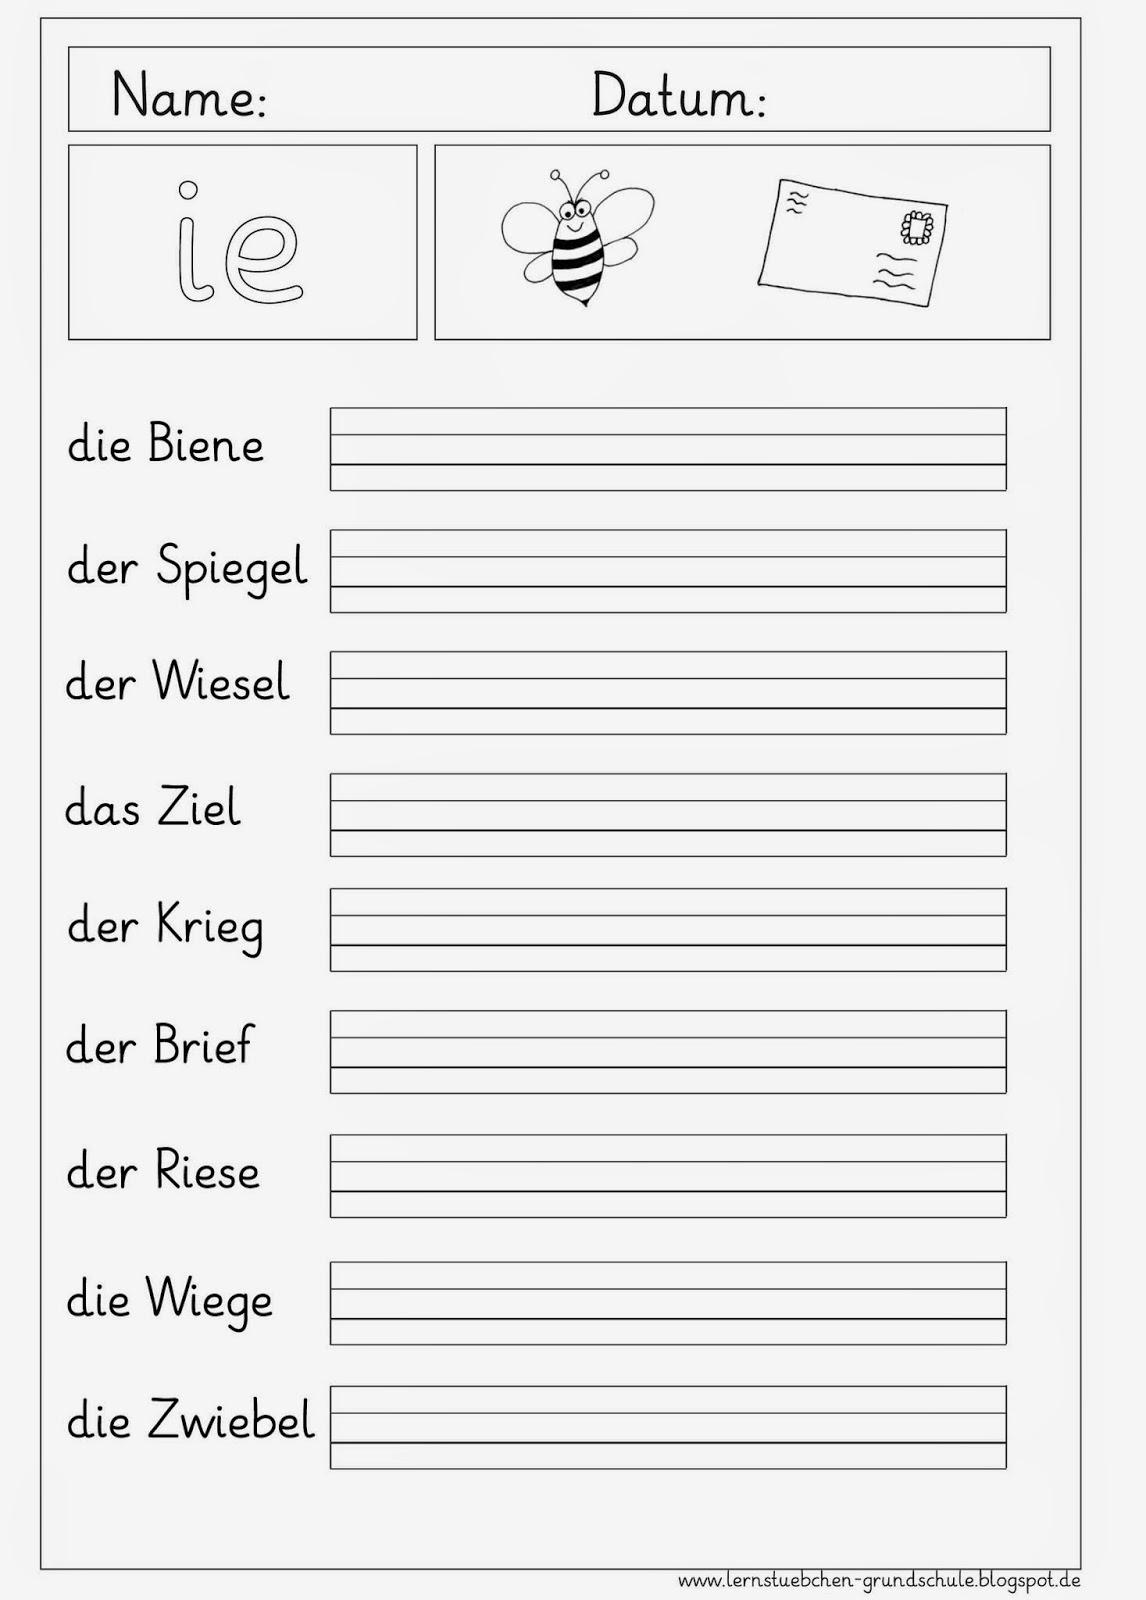 Deutsch arbeitsblatt 3086578 - archeryinfo.info